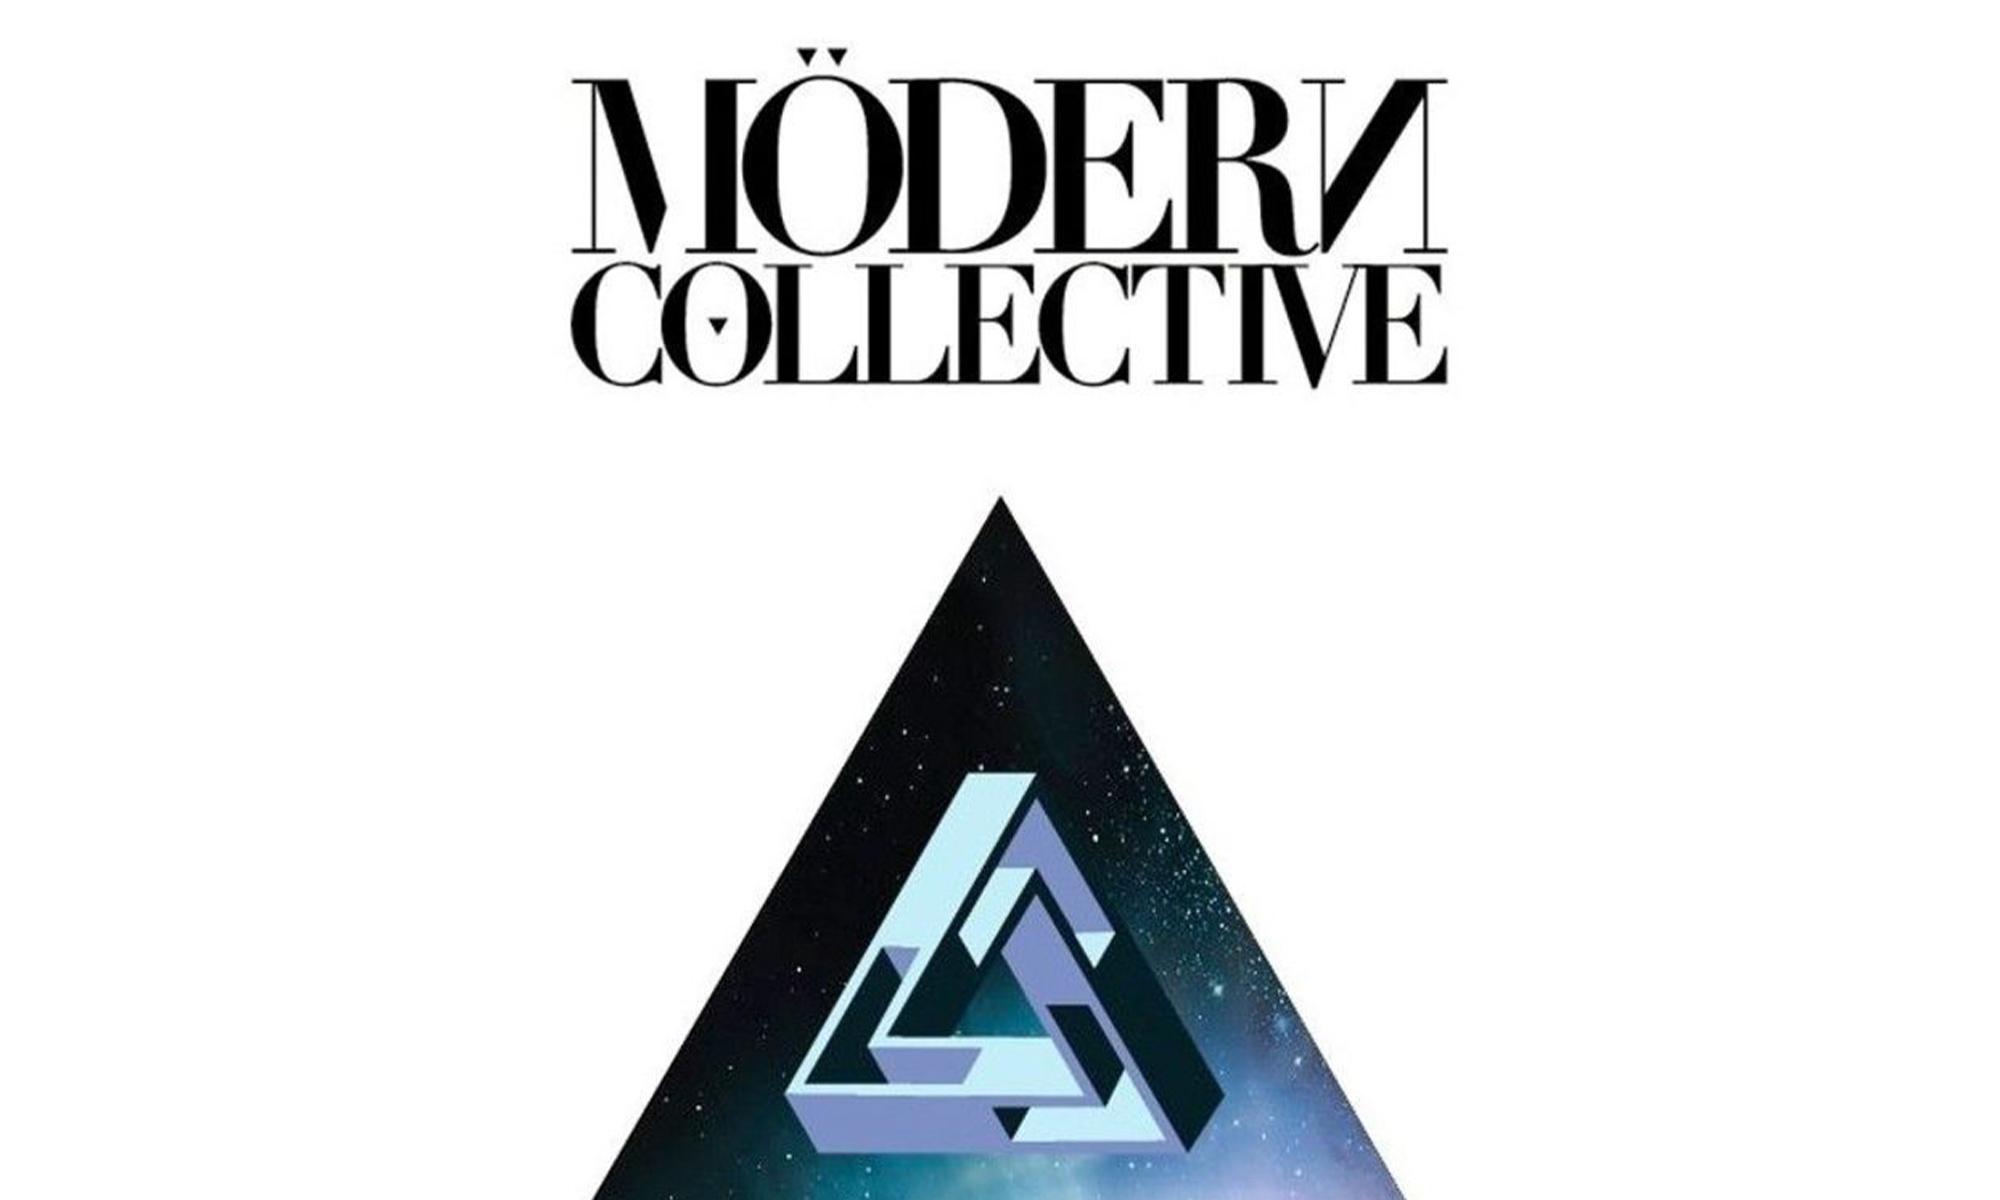 Mödern collective